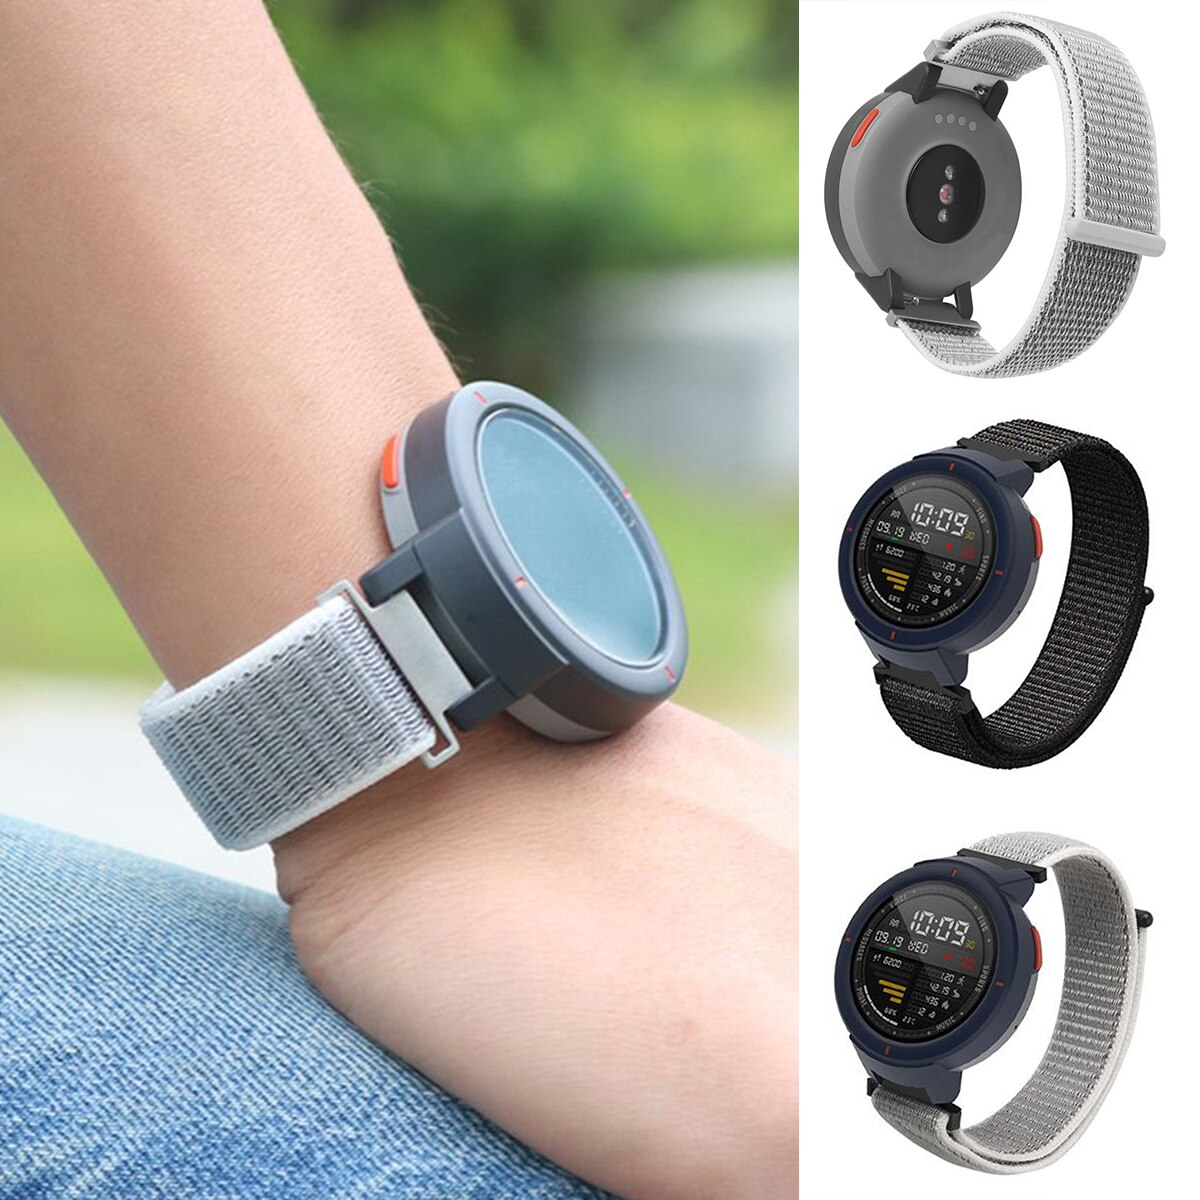 SOONHUA correa de reloj de nailon ajustable correa de reloj de bucle Flexible correas para Huami Amazfit Verge 3